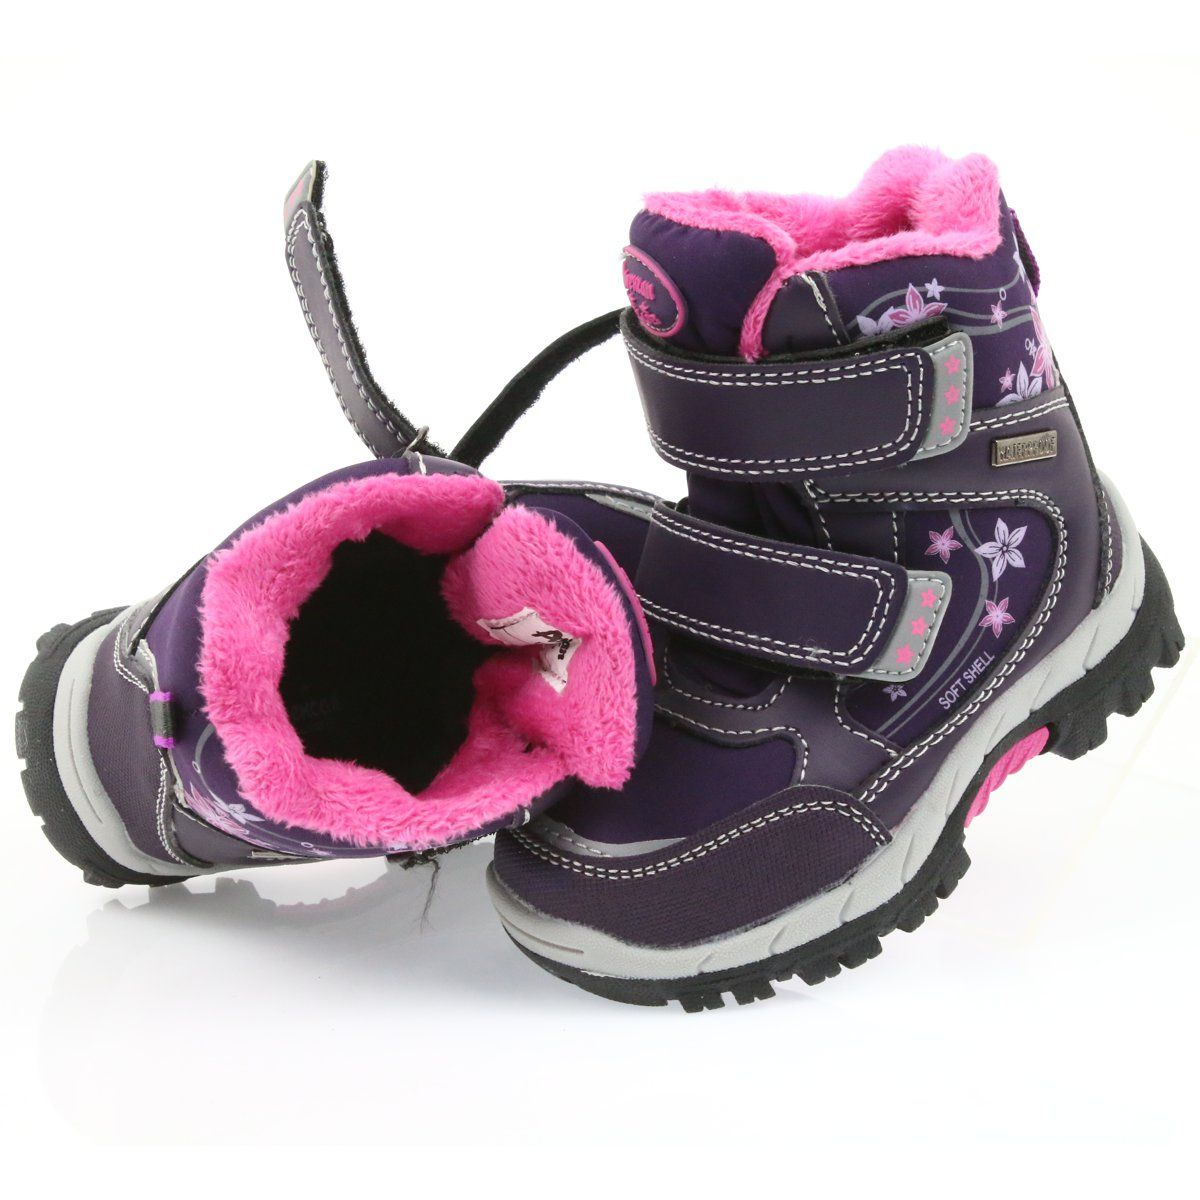 American Club American Kozaki Buty Zimowe Z Membrana 3121 Fioletowe Boots Shoes Baby Shoes